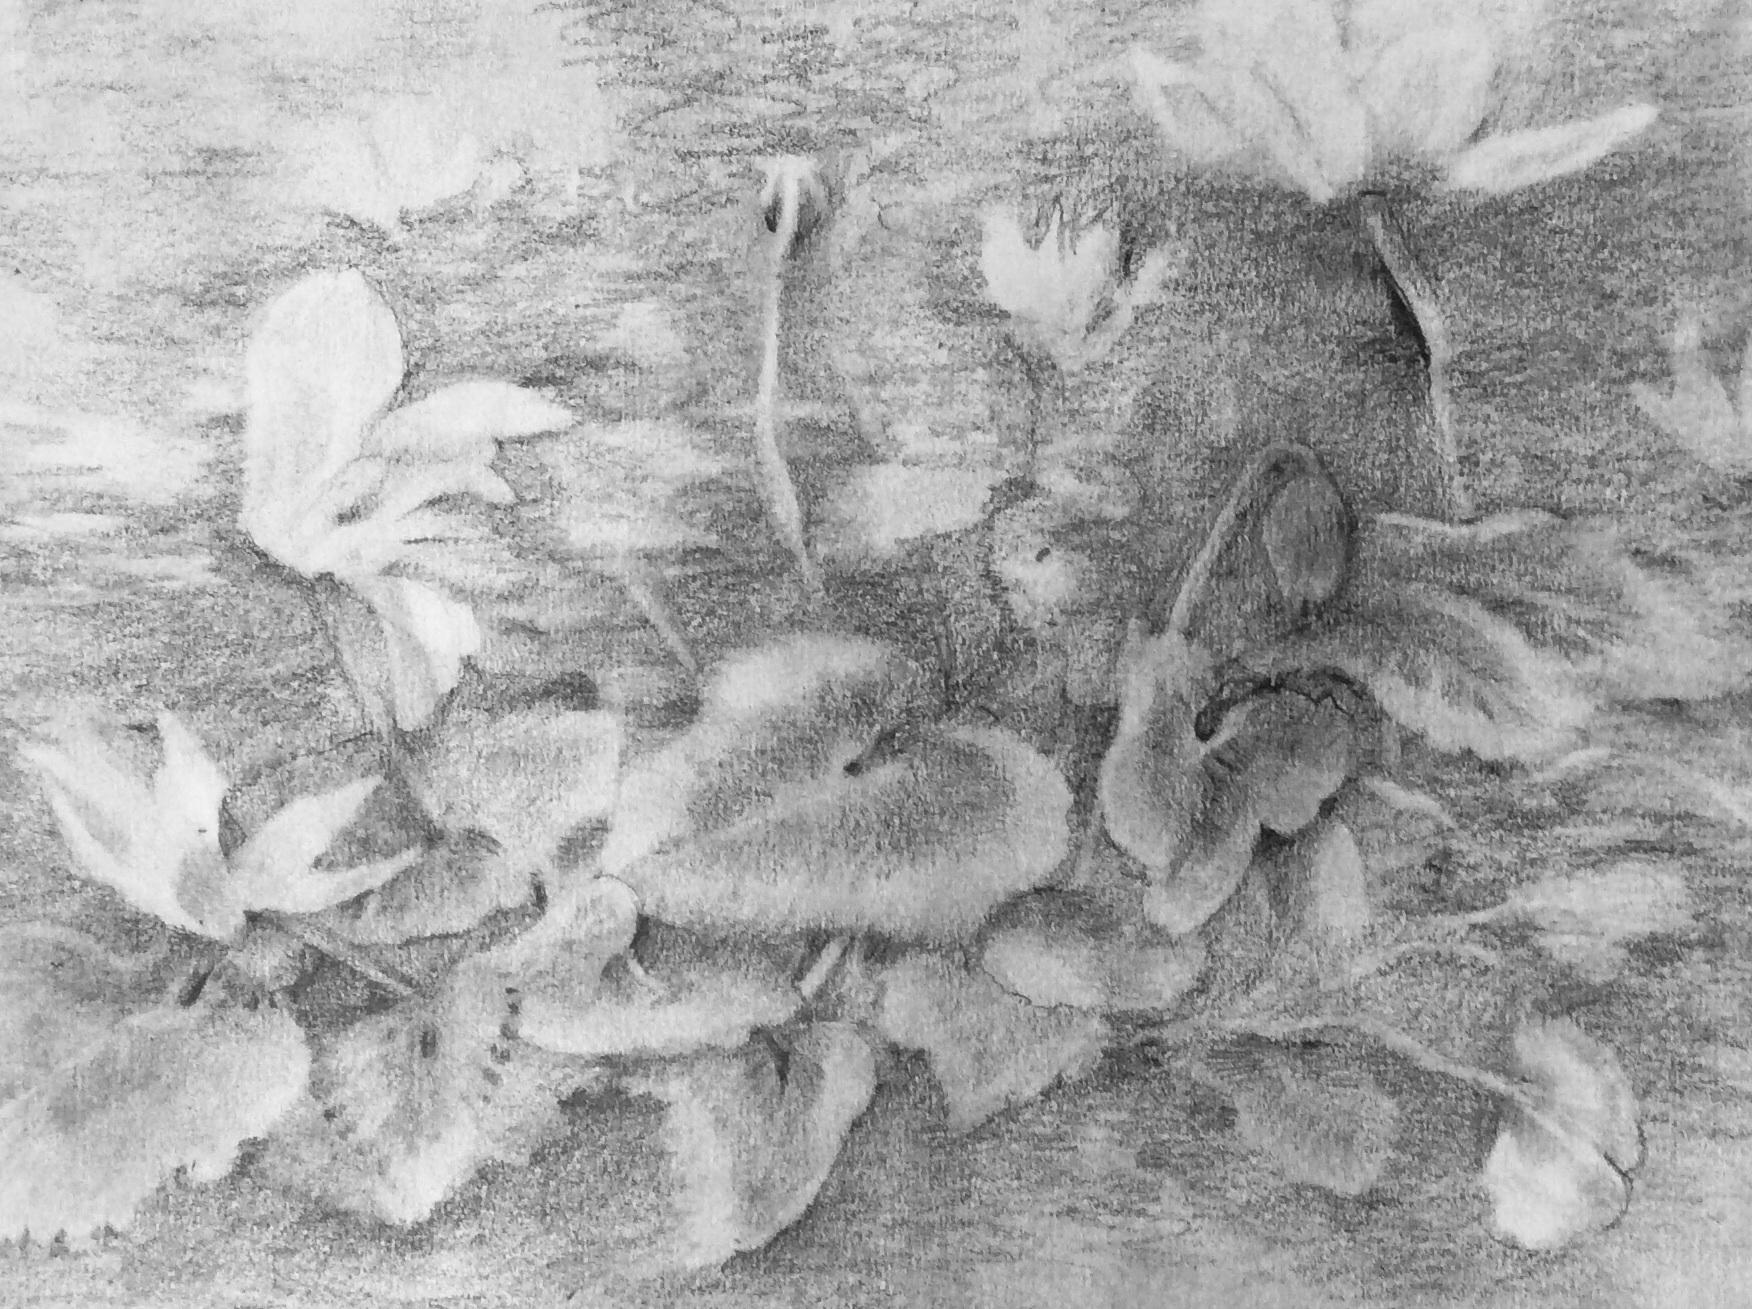 Pencil on paper 22 x 28 cm £175